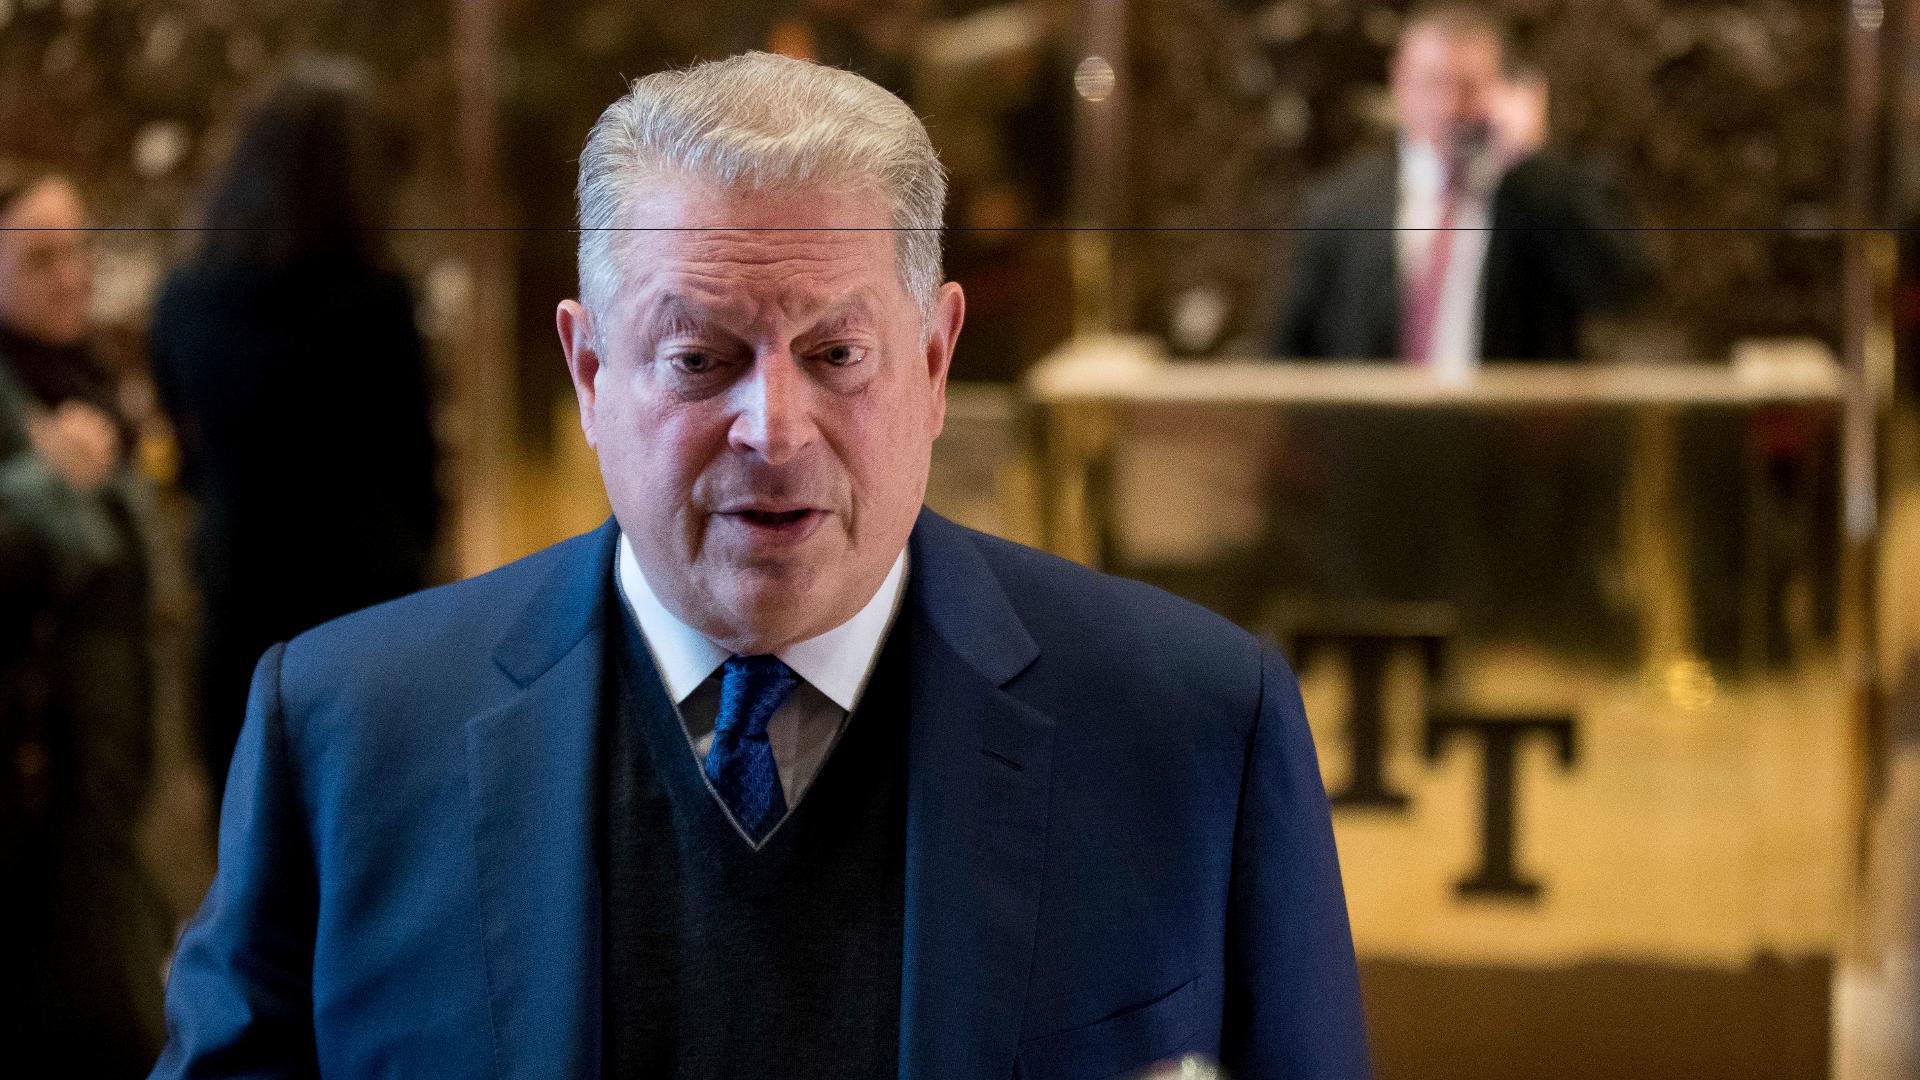 Al Gore Meets With Donald Trump The Washington Post